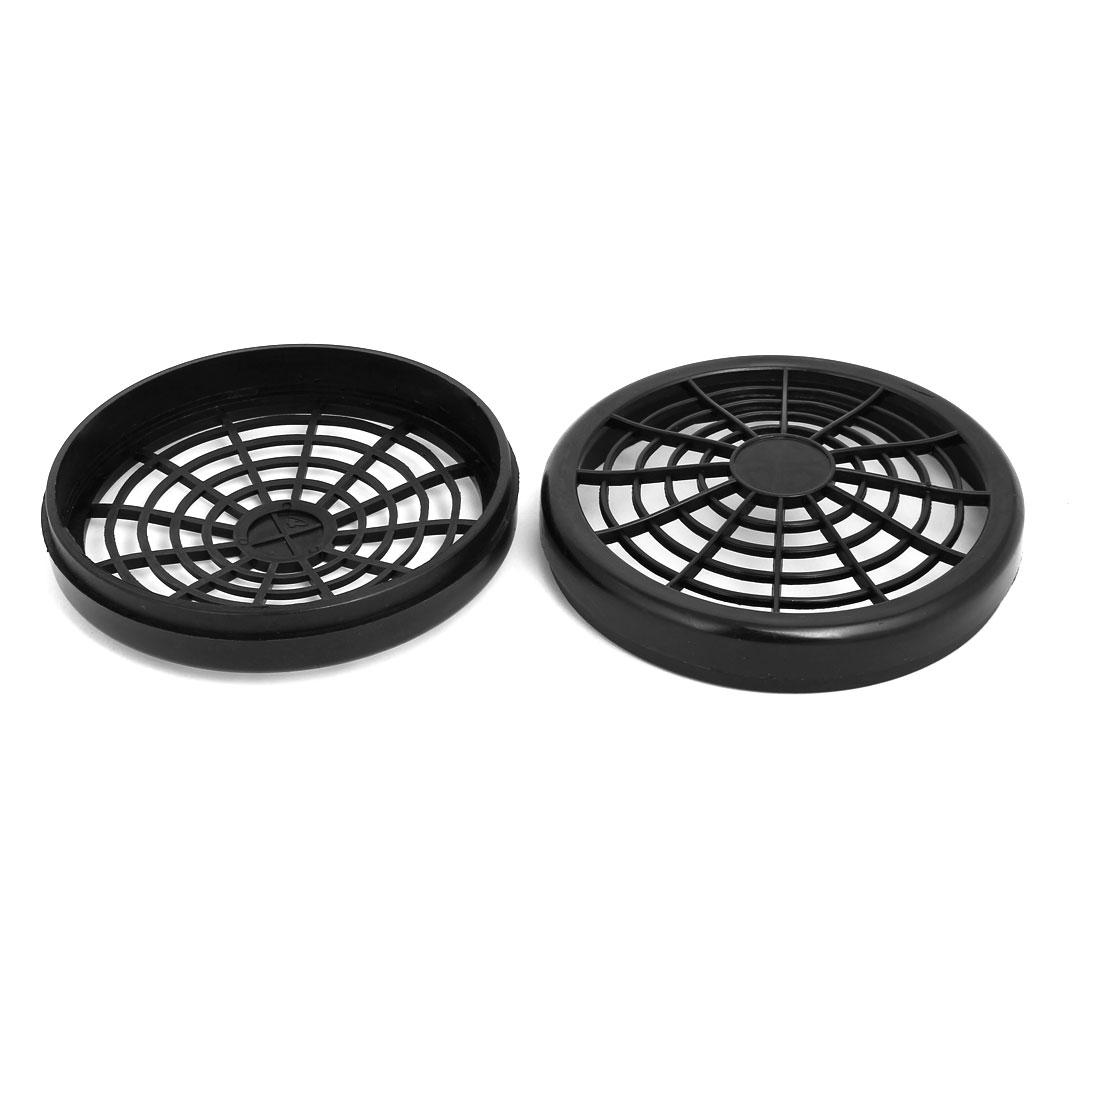 1100W/1500W 155mm Dia Plastic Air Compressor Replacement Fan Cover Black 2pcs